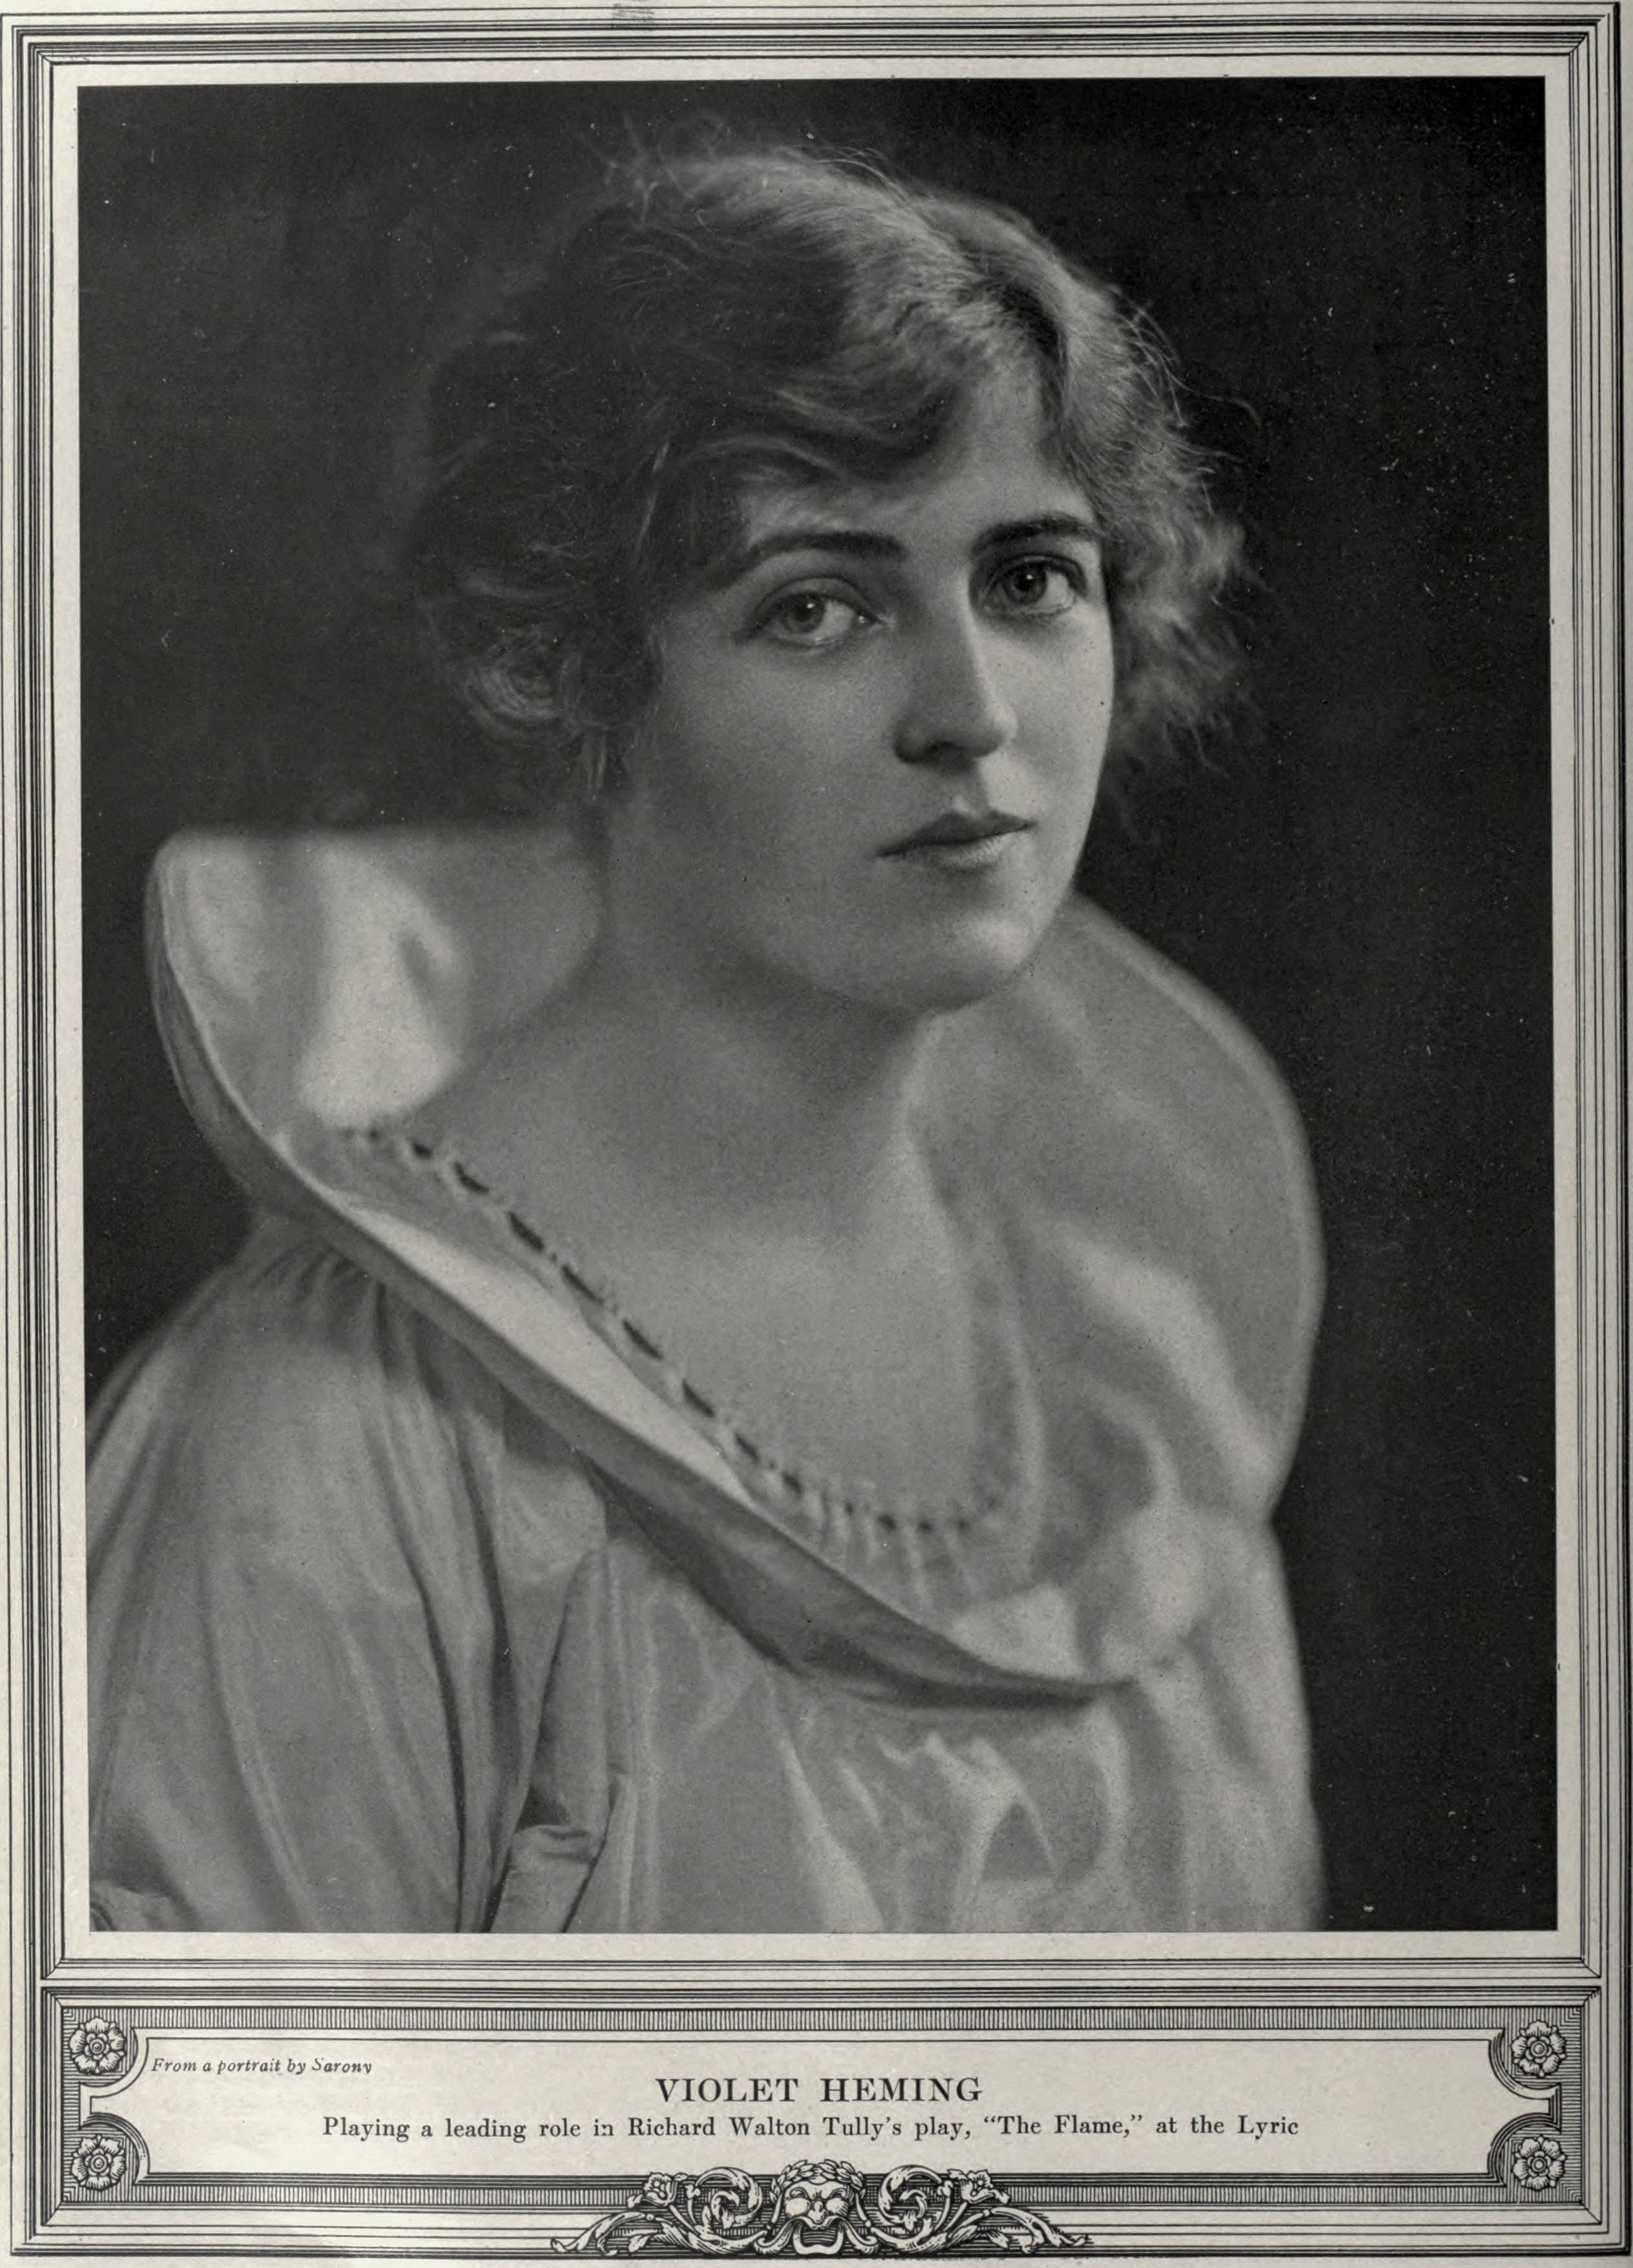 Violet Heming